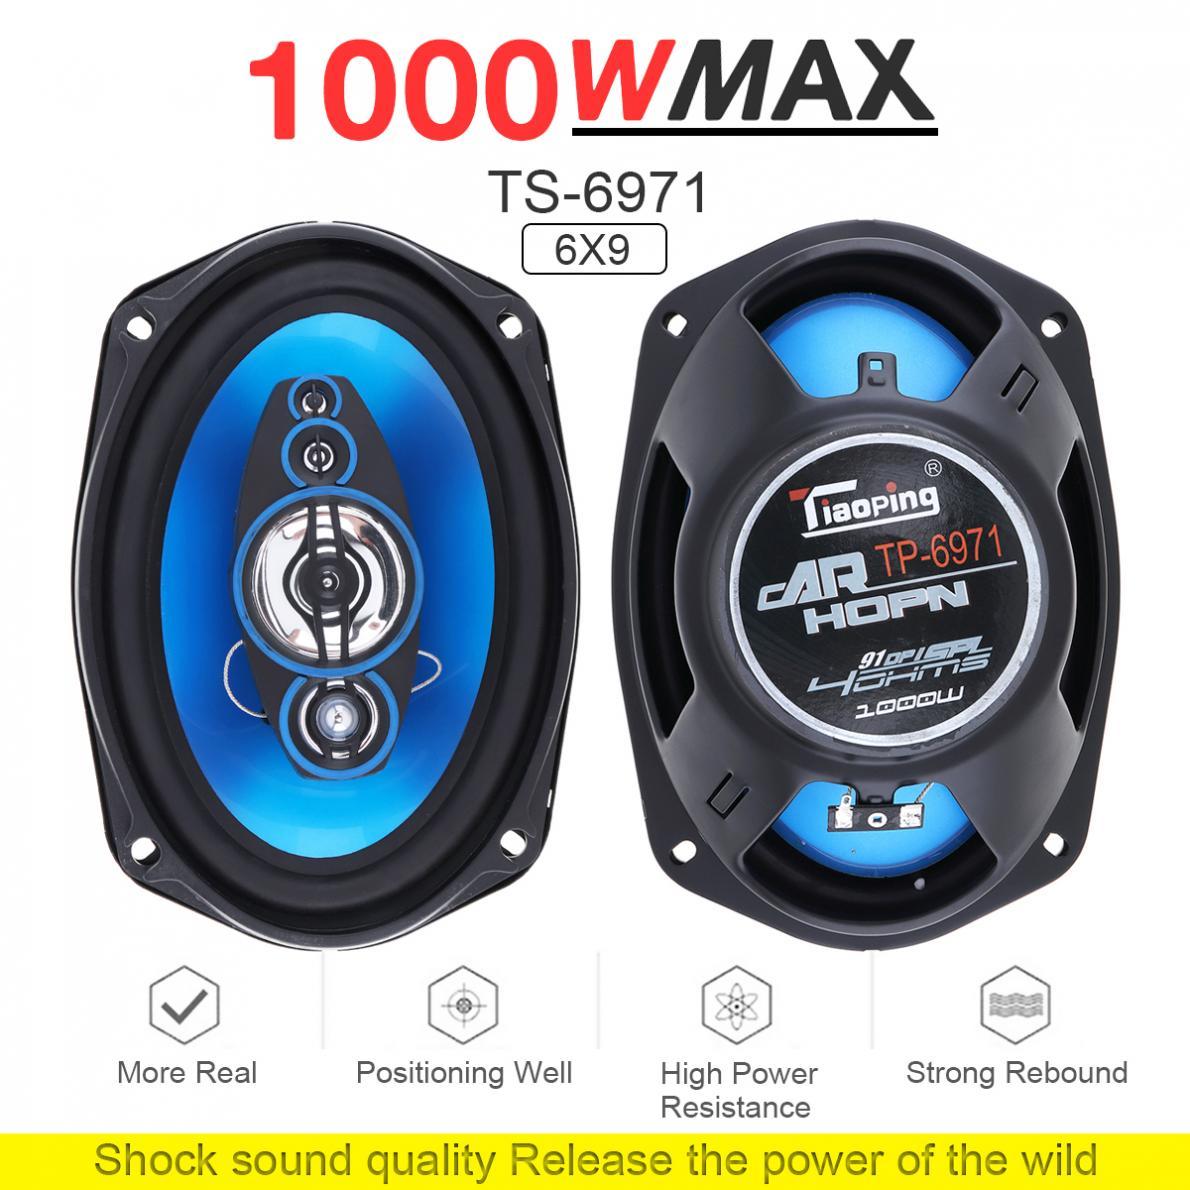 Car Loudspeaker,6x9in 1000W Pair of Auto Car HiFi Stereo Audio Coaxial Speakers Loudspeaker TP-6971 Blue Black